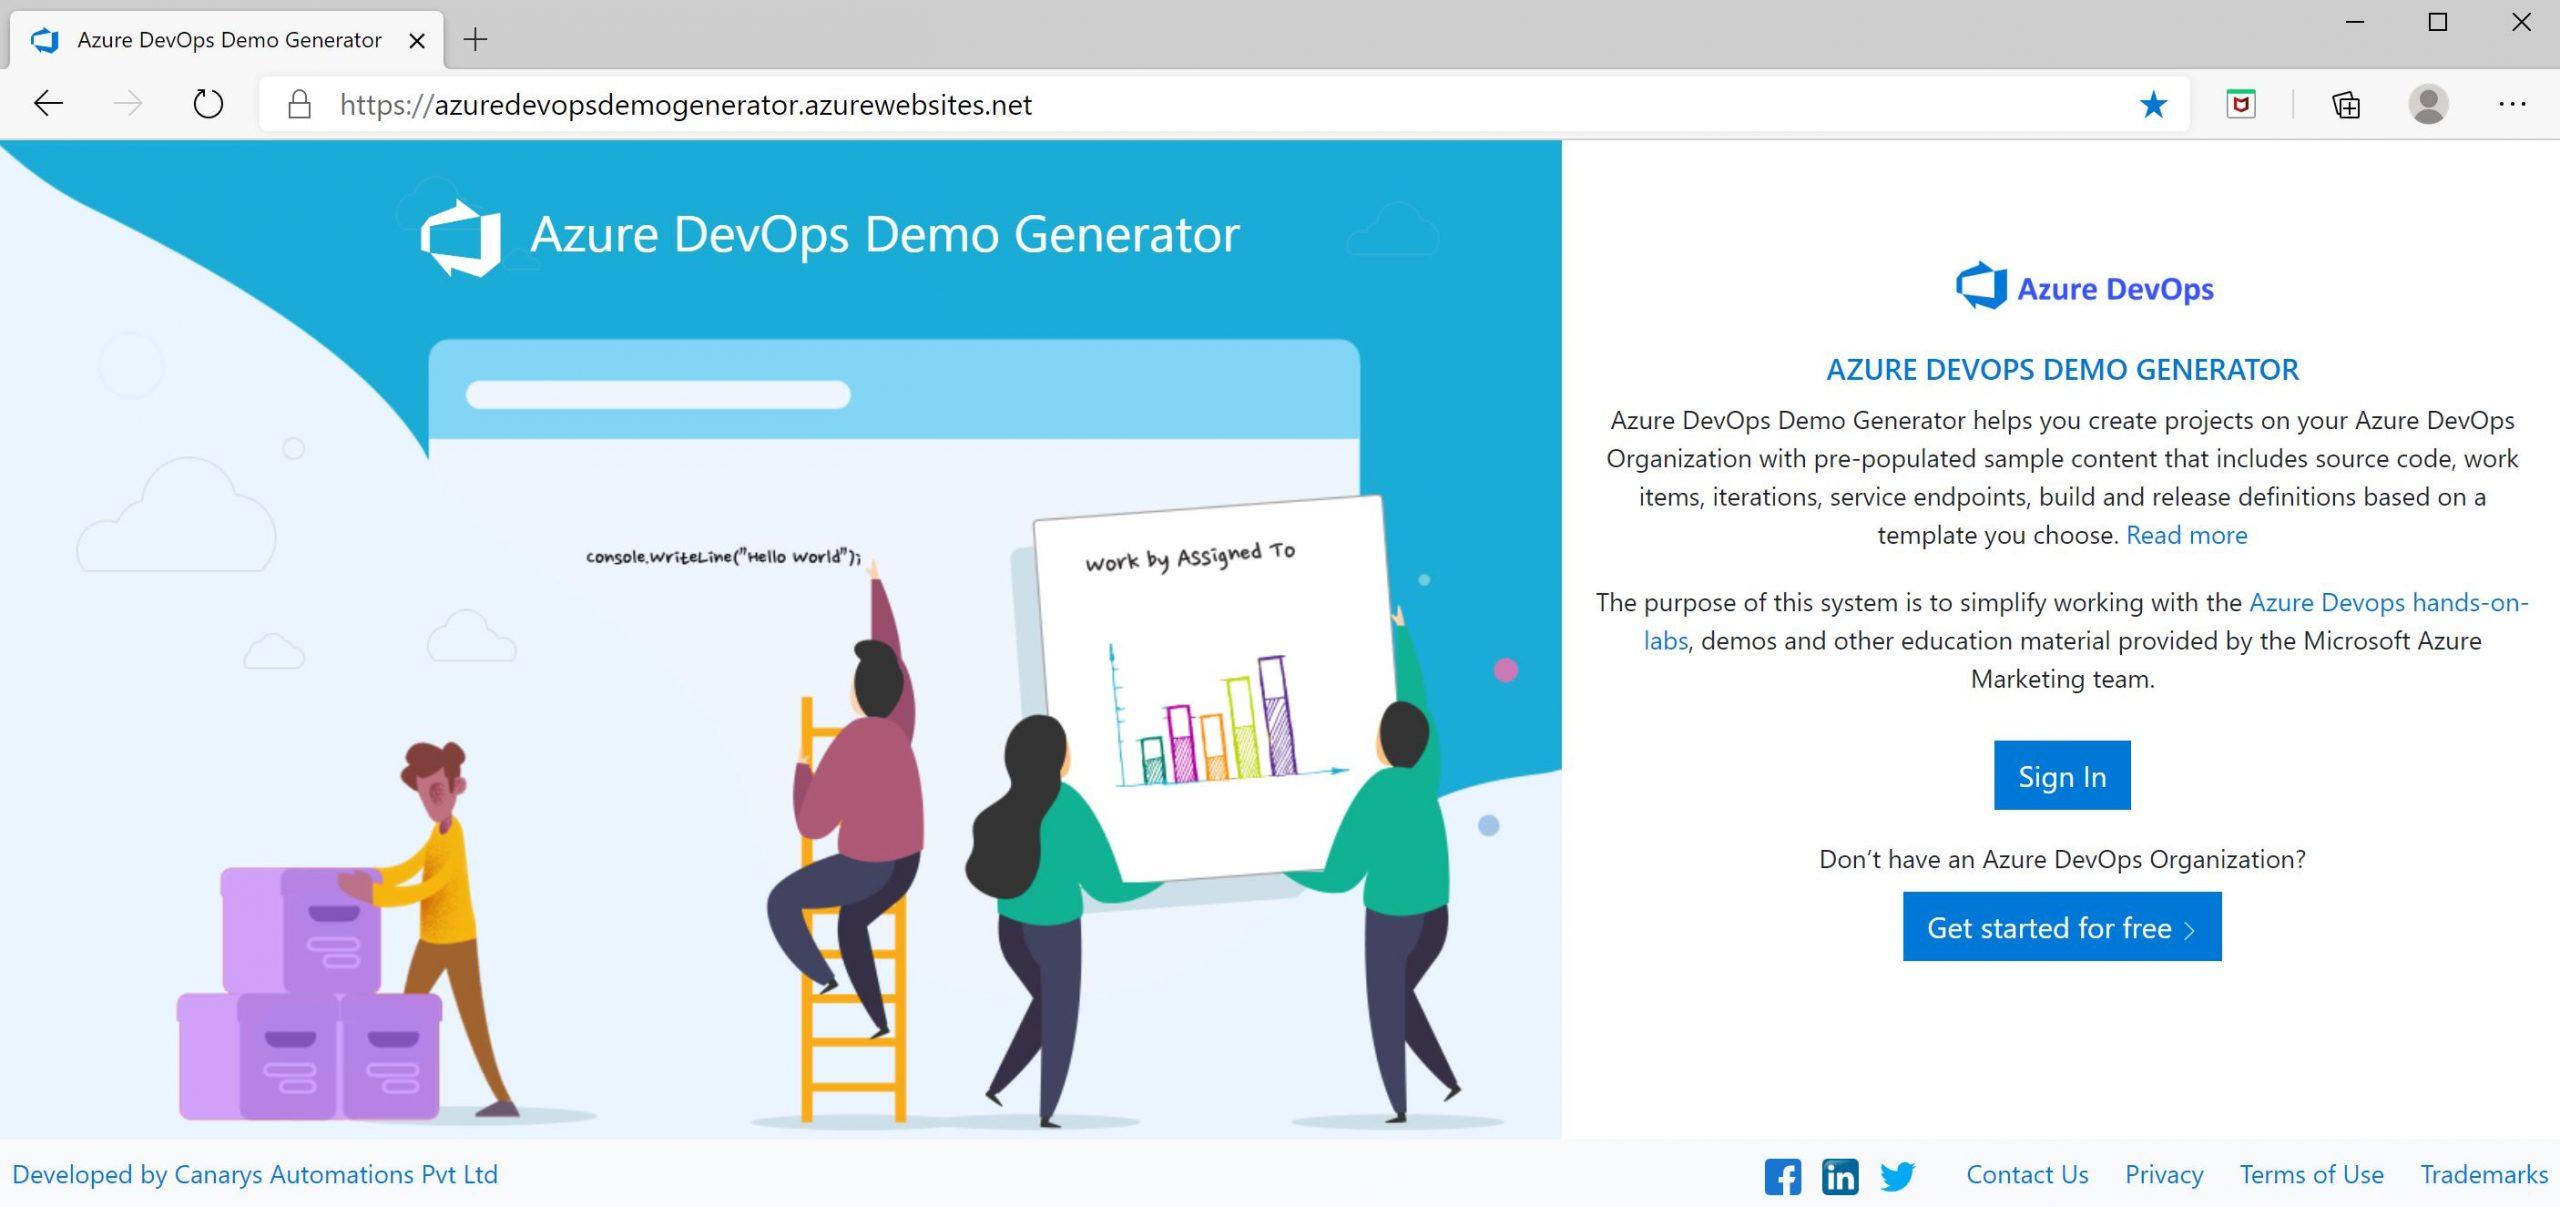 Azure DevOps: Azure DevOps Demo Generator